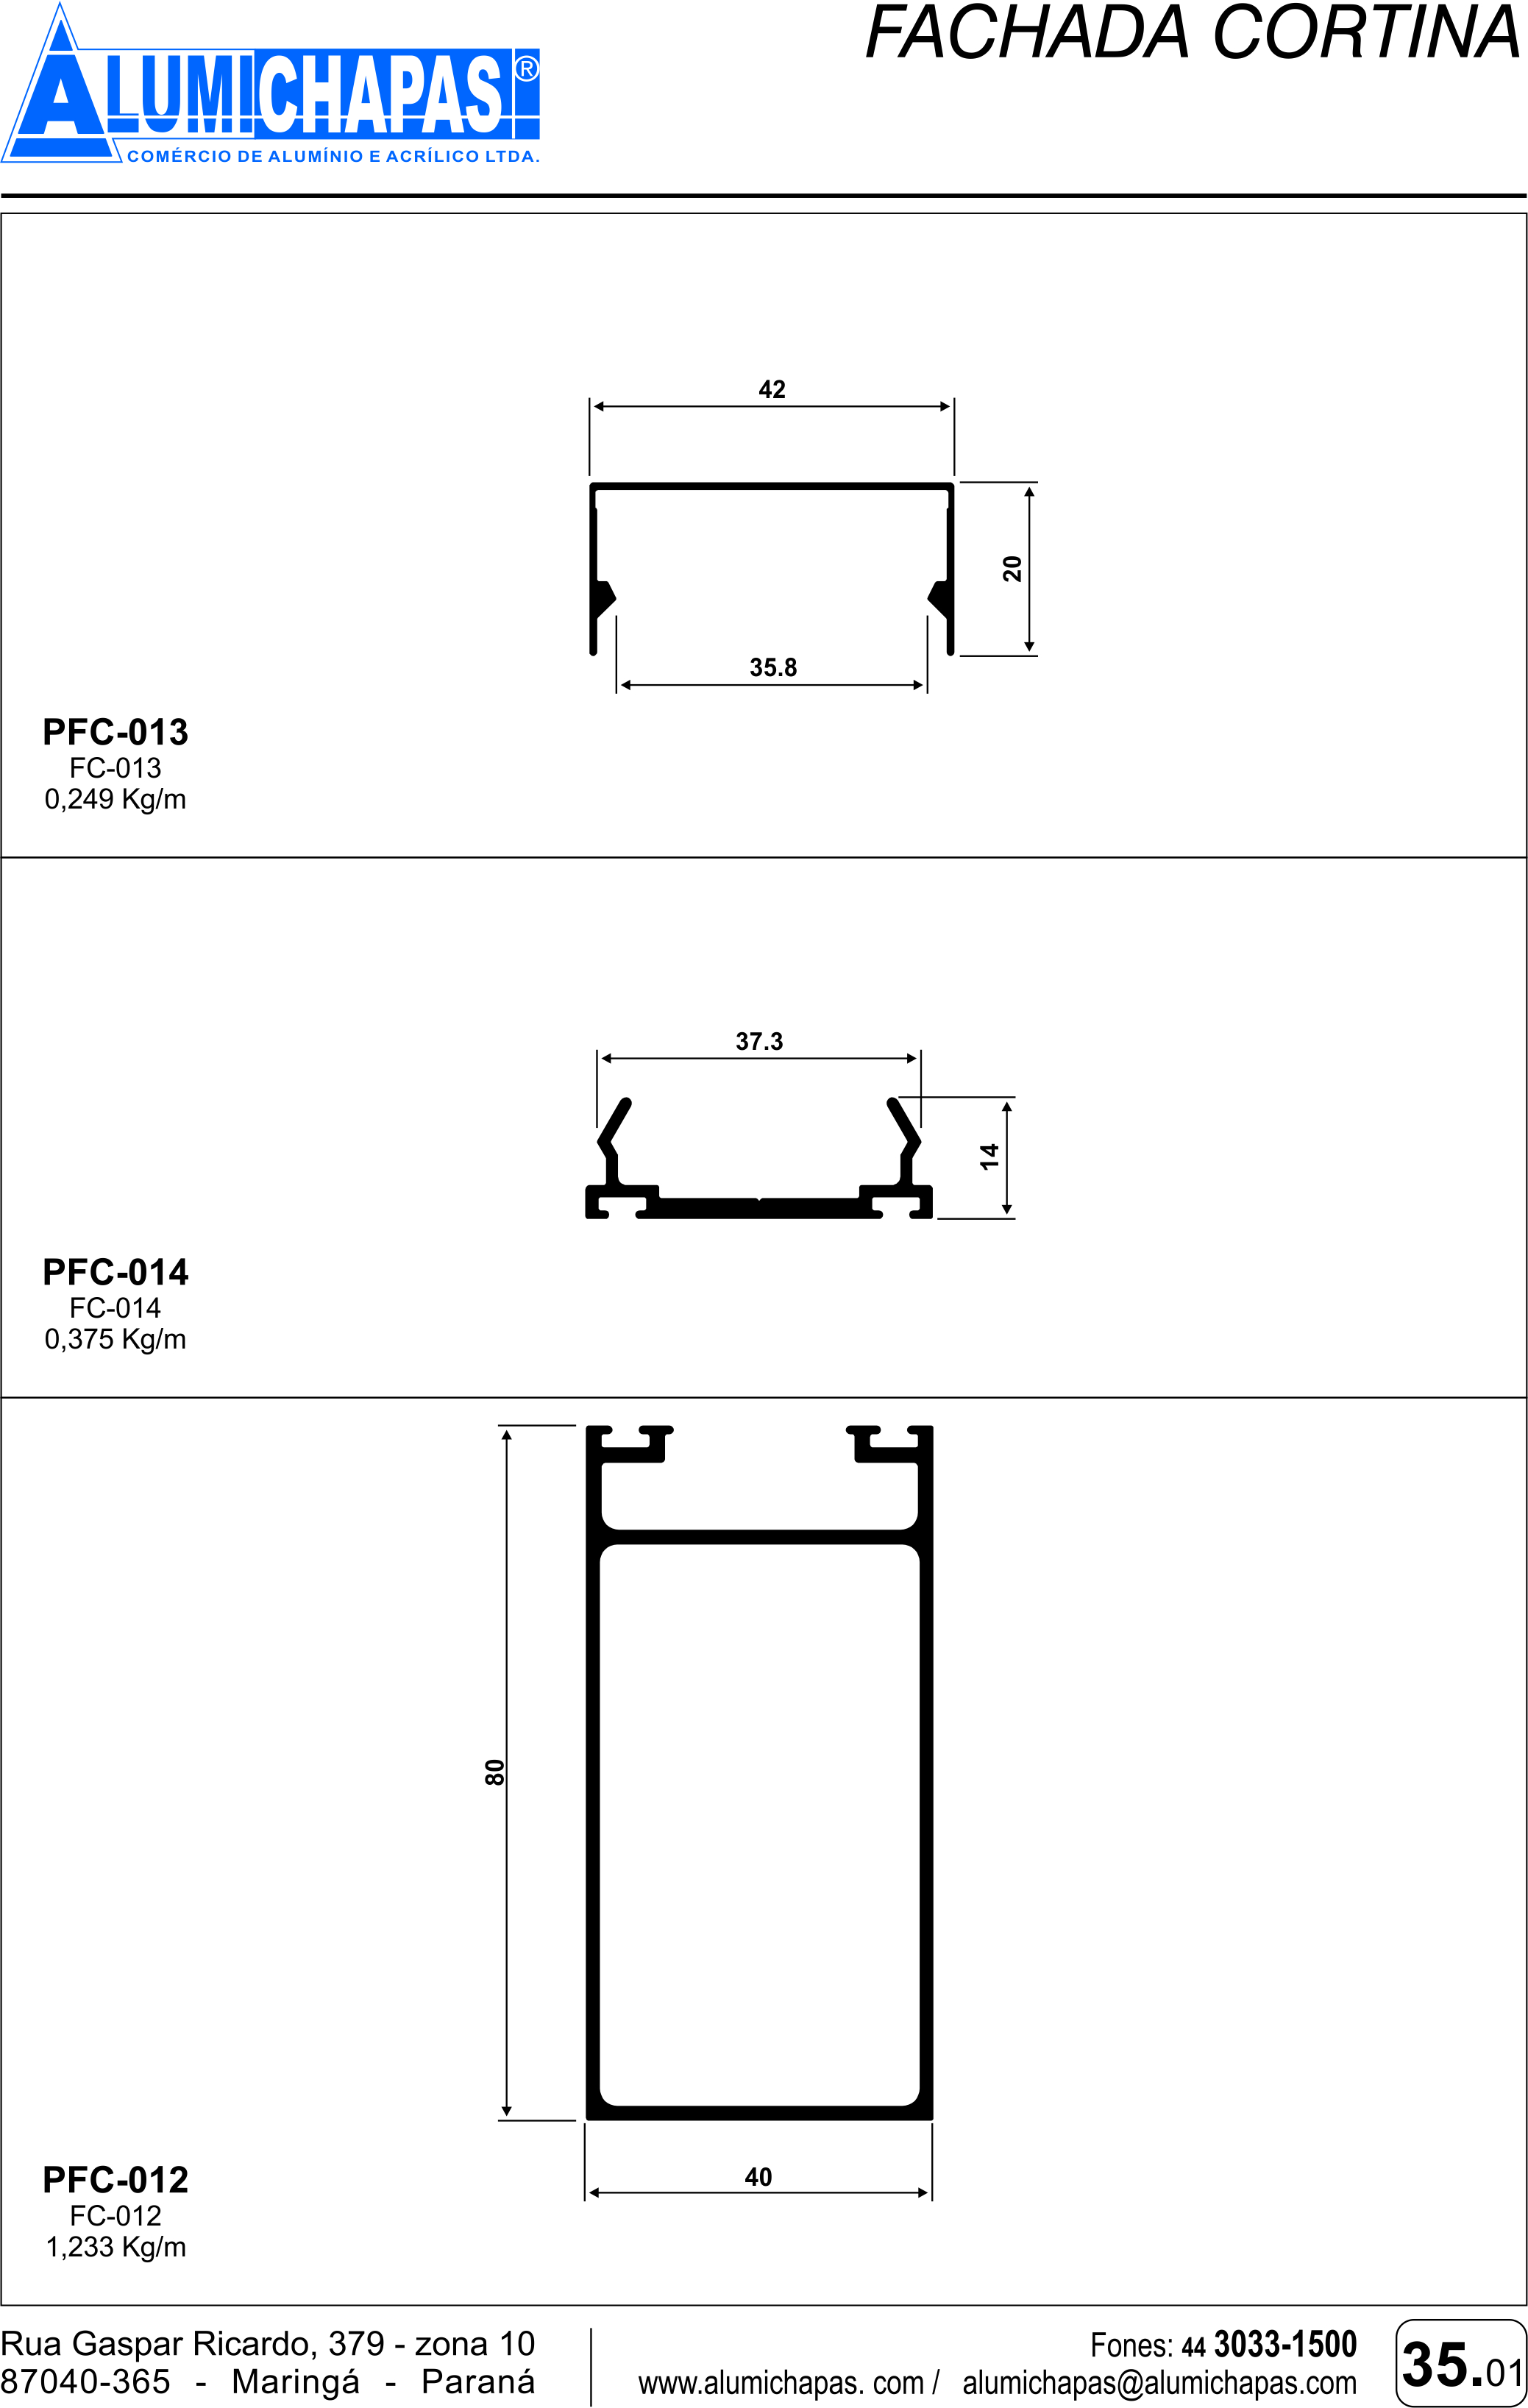 Fachada cortina 1